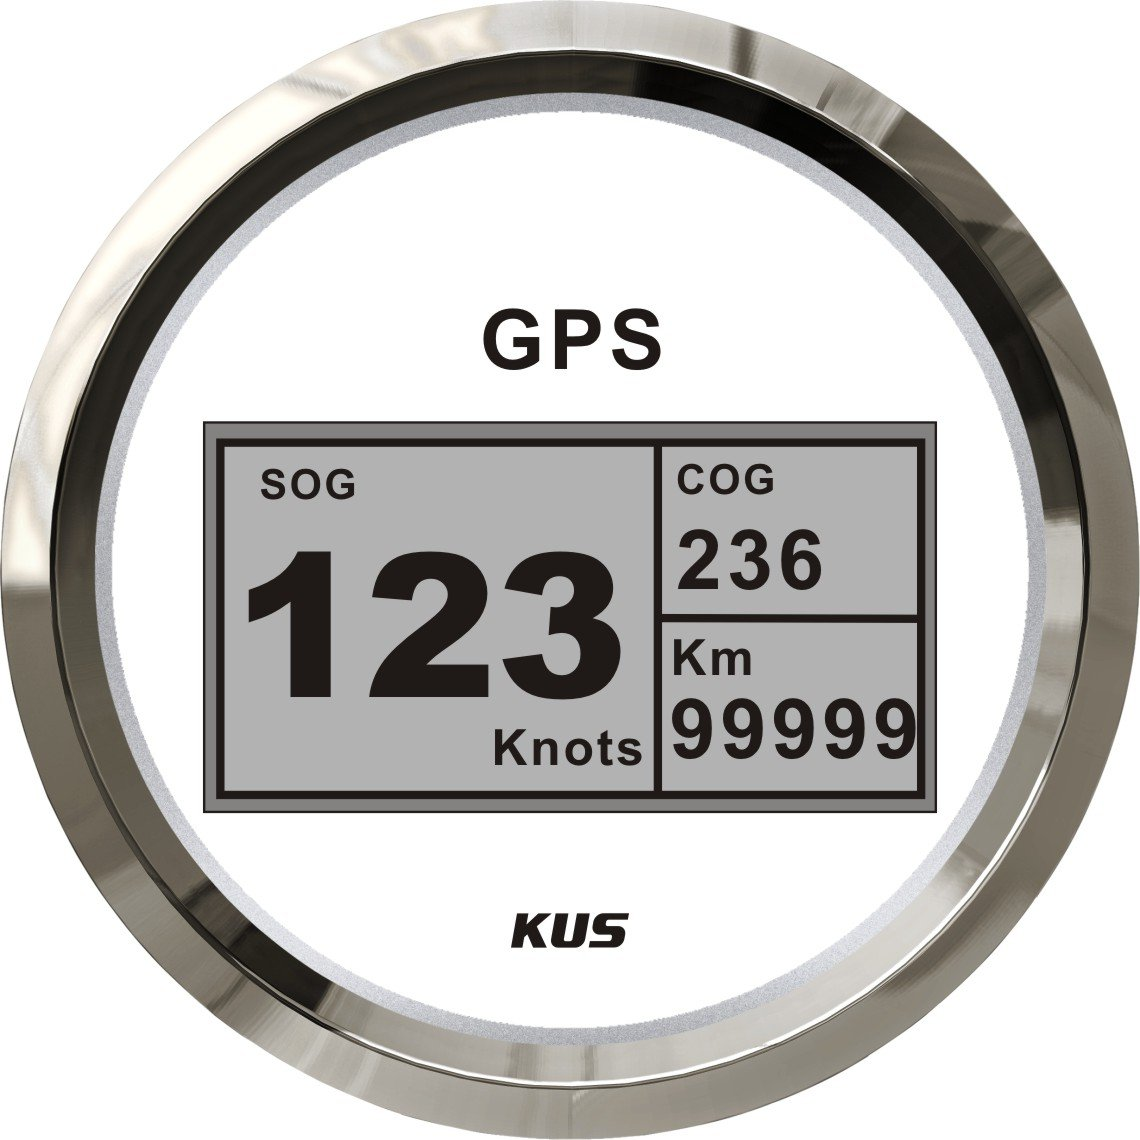 Kus digitale GPS tachimetro calibro 0 –  999 km/h per auto camion moto 3 –  3/20, 3 cm 12 V/24 V 3cm 12V/24V SPR